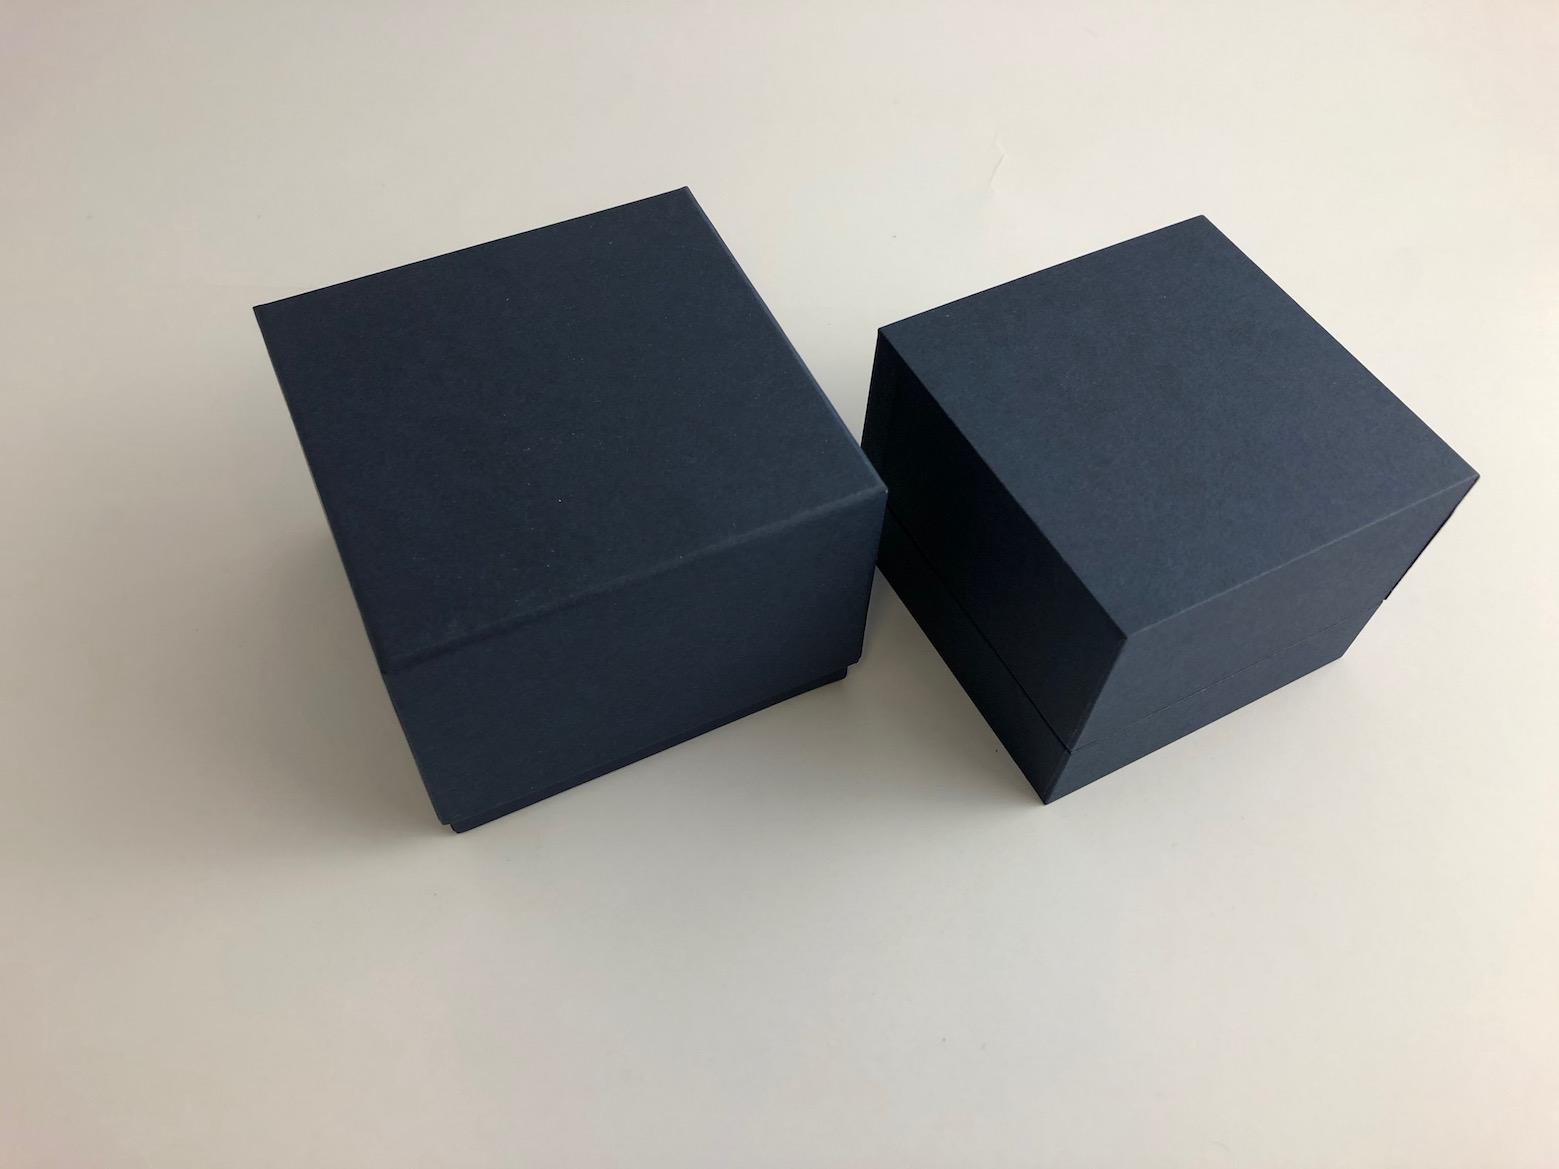 New Blue Envy Jewellery Box